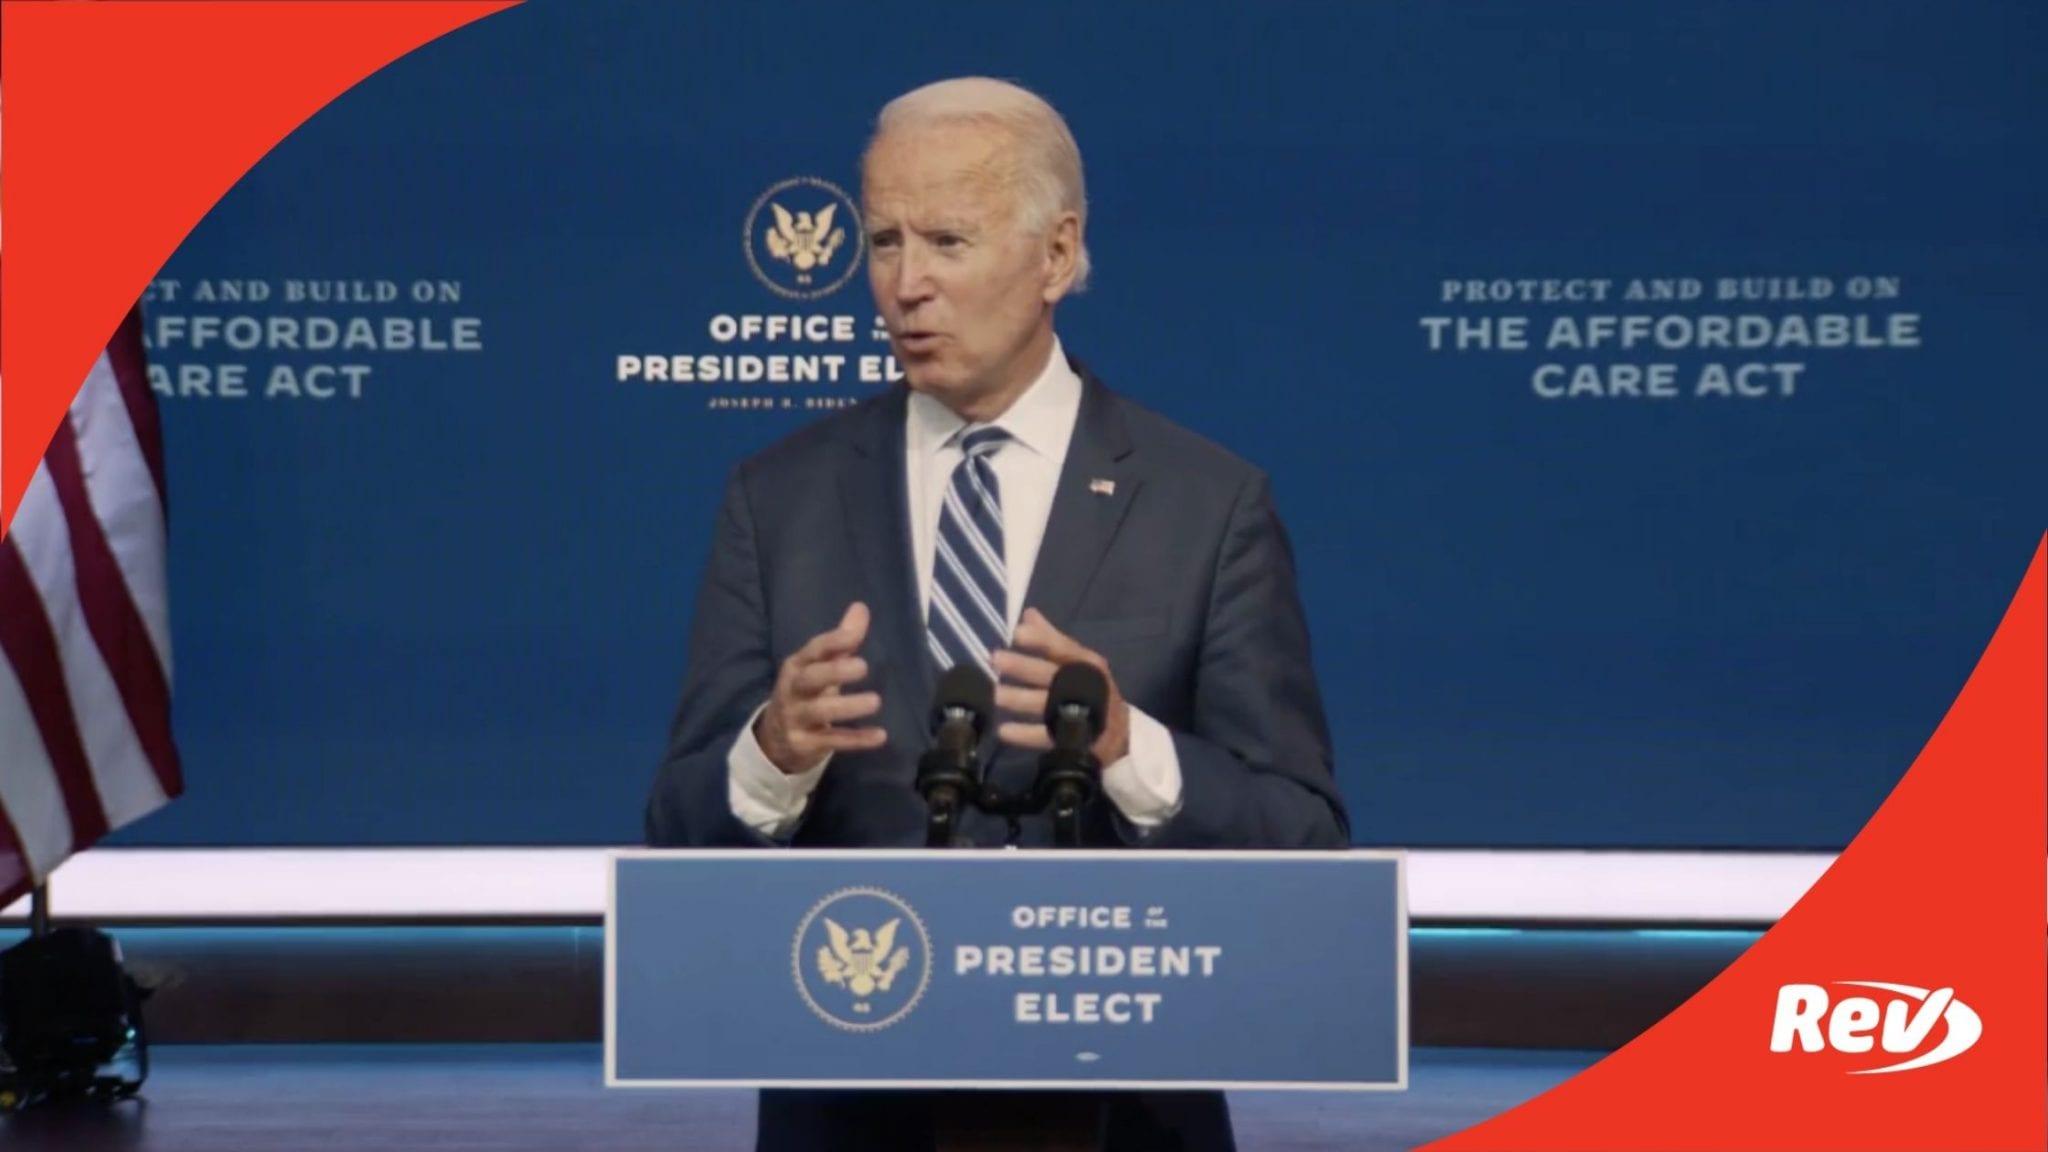 Joe Biden Press Conference on Affordable Care Act Transcript November 10